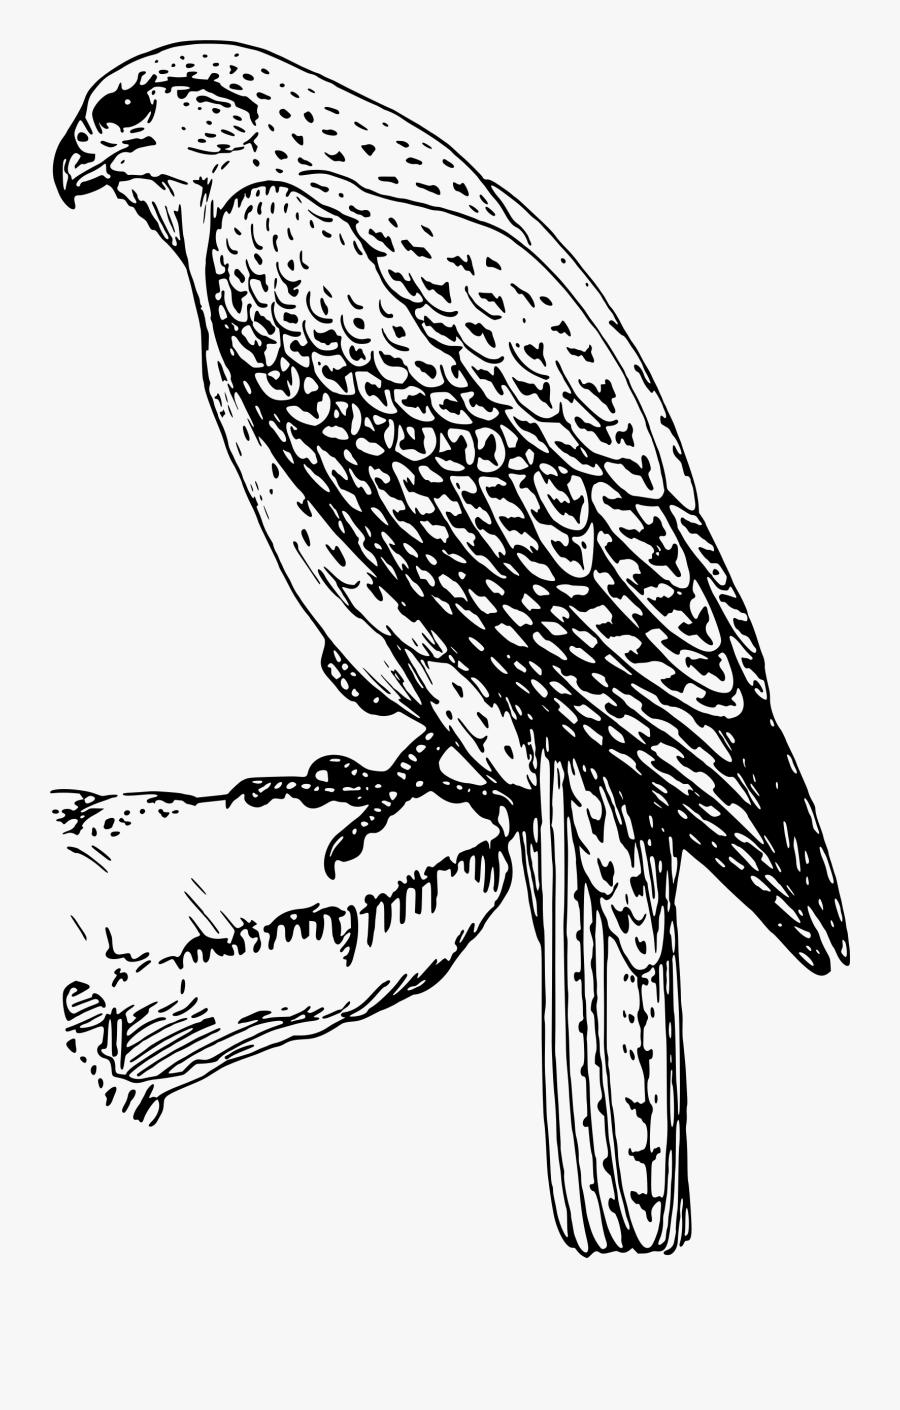 Transparent Peregrine Falcon Png - Falcon Bird Clipart Black And White, Transparent Clipart